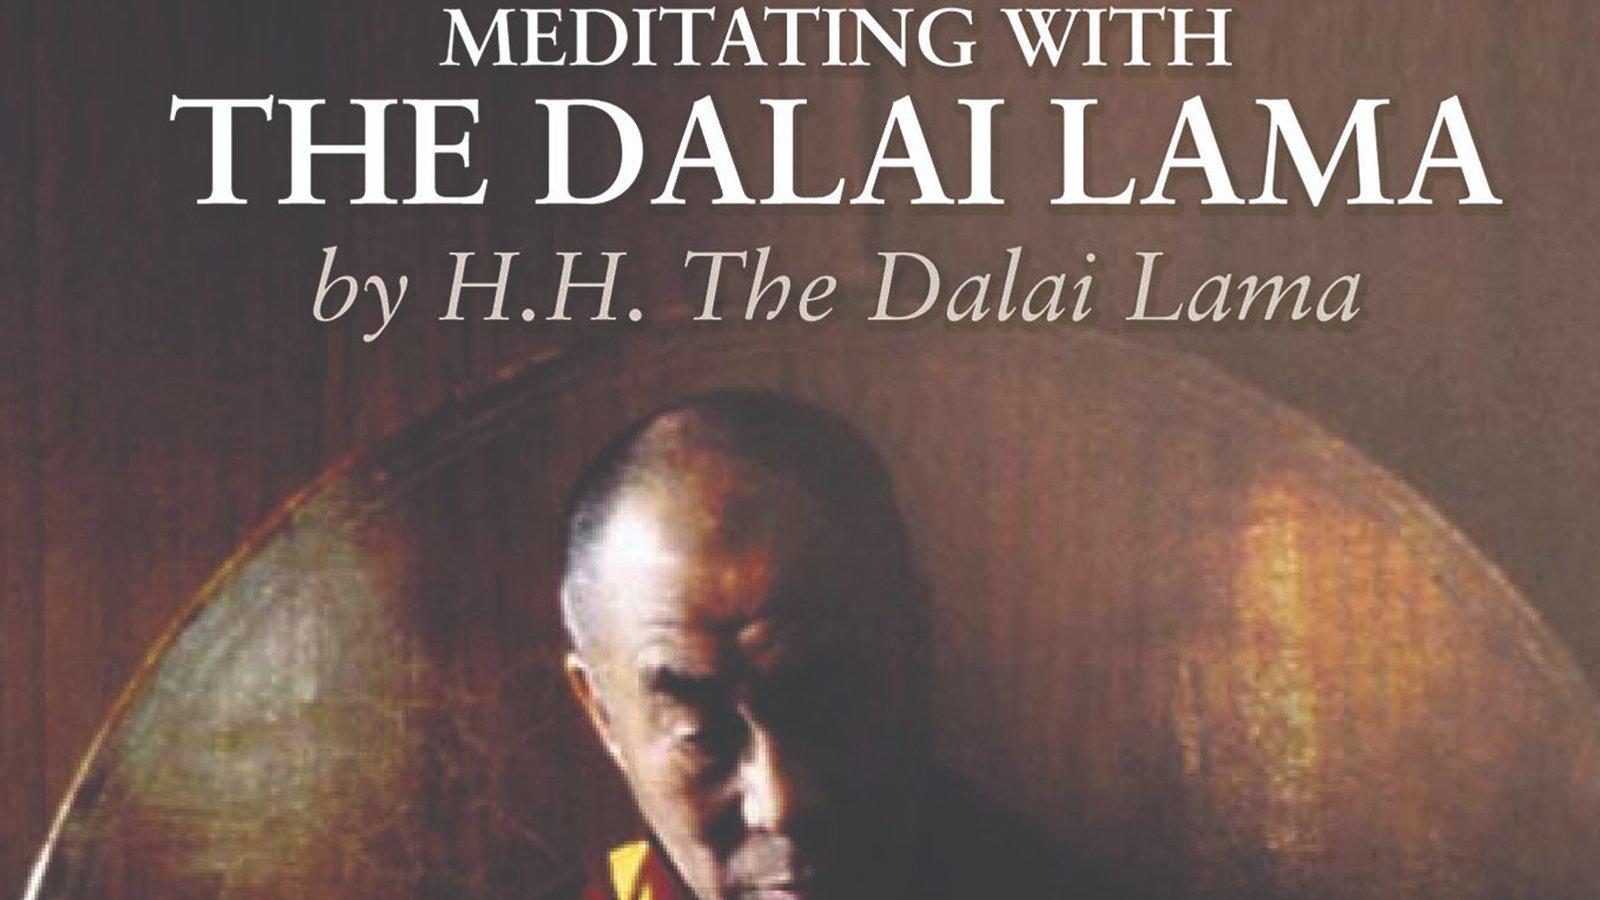 Meditating With The Dalai Lama